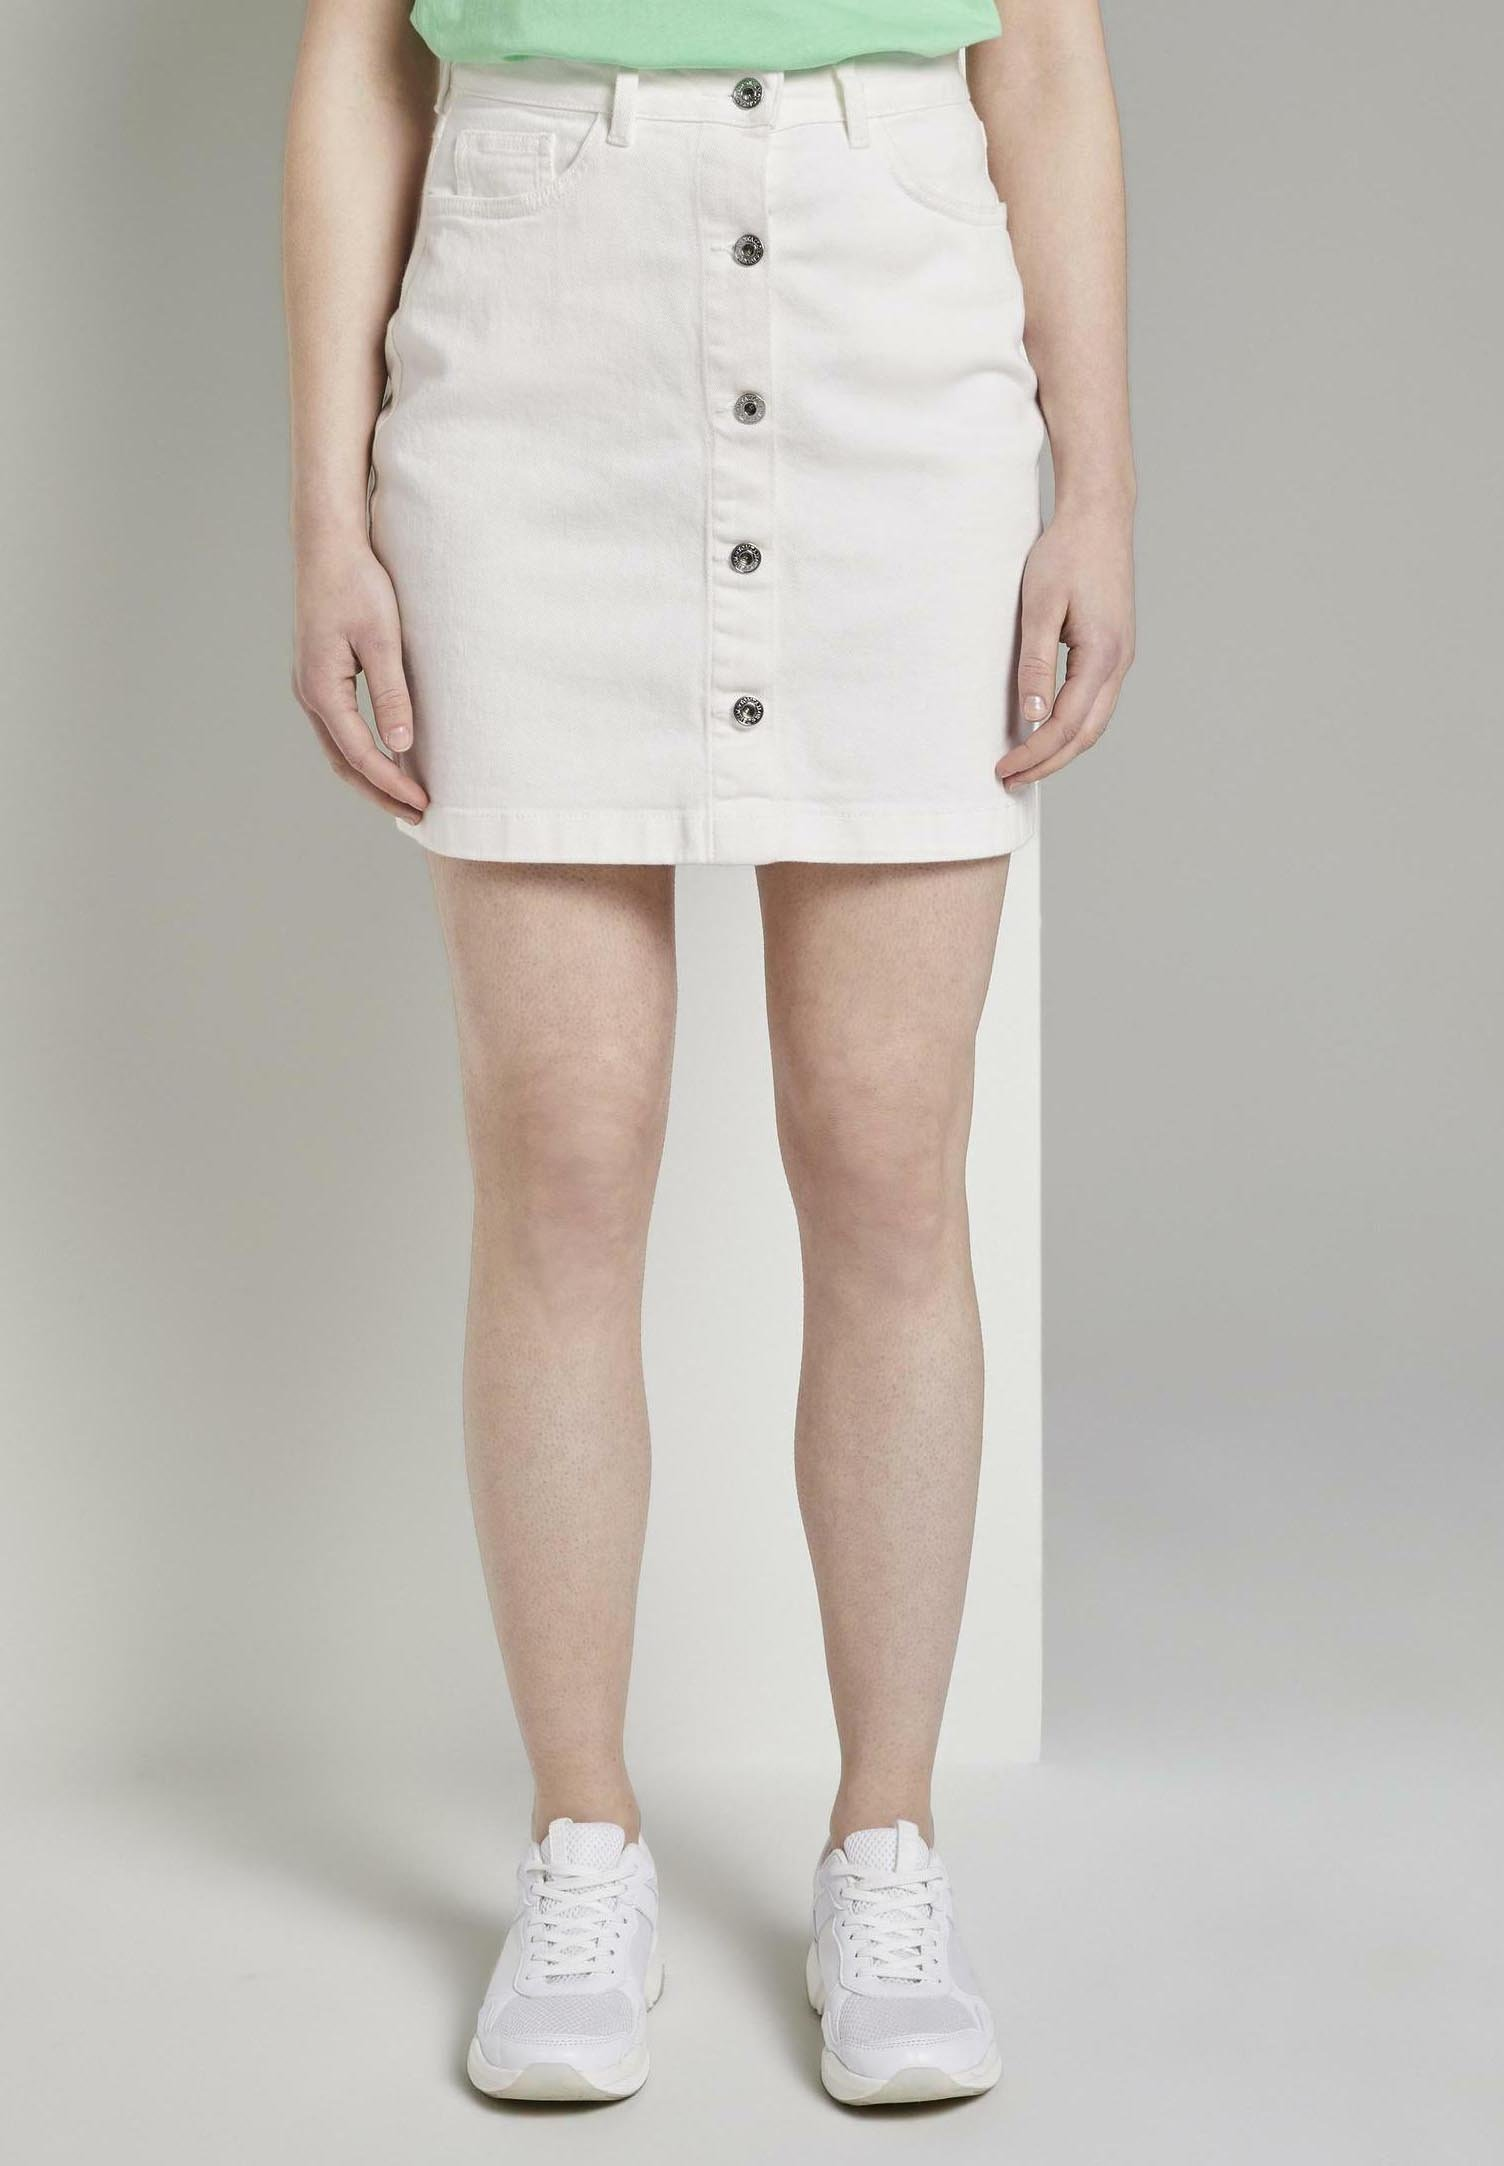 Femme MIT KNOPFLEISTE IN A-LINIE - Jupe en jean